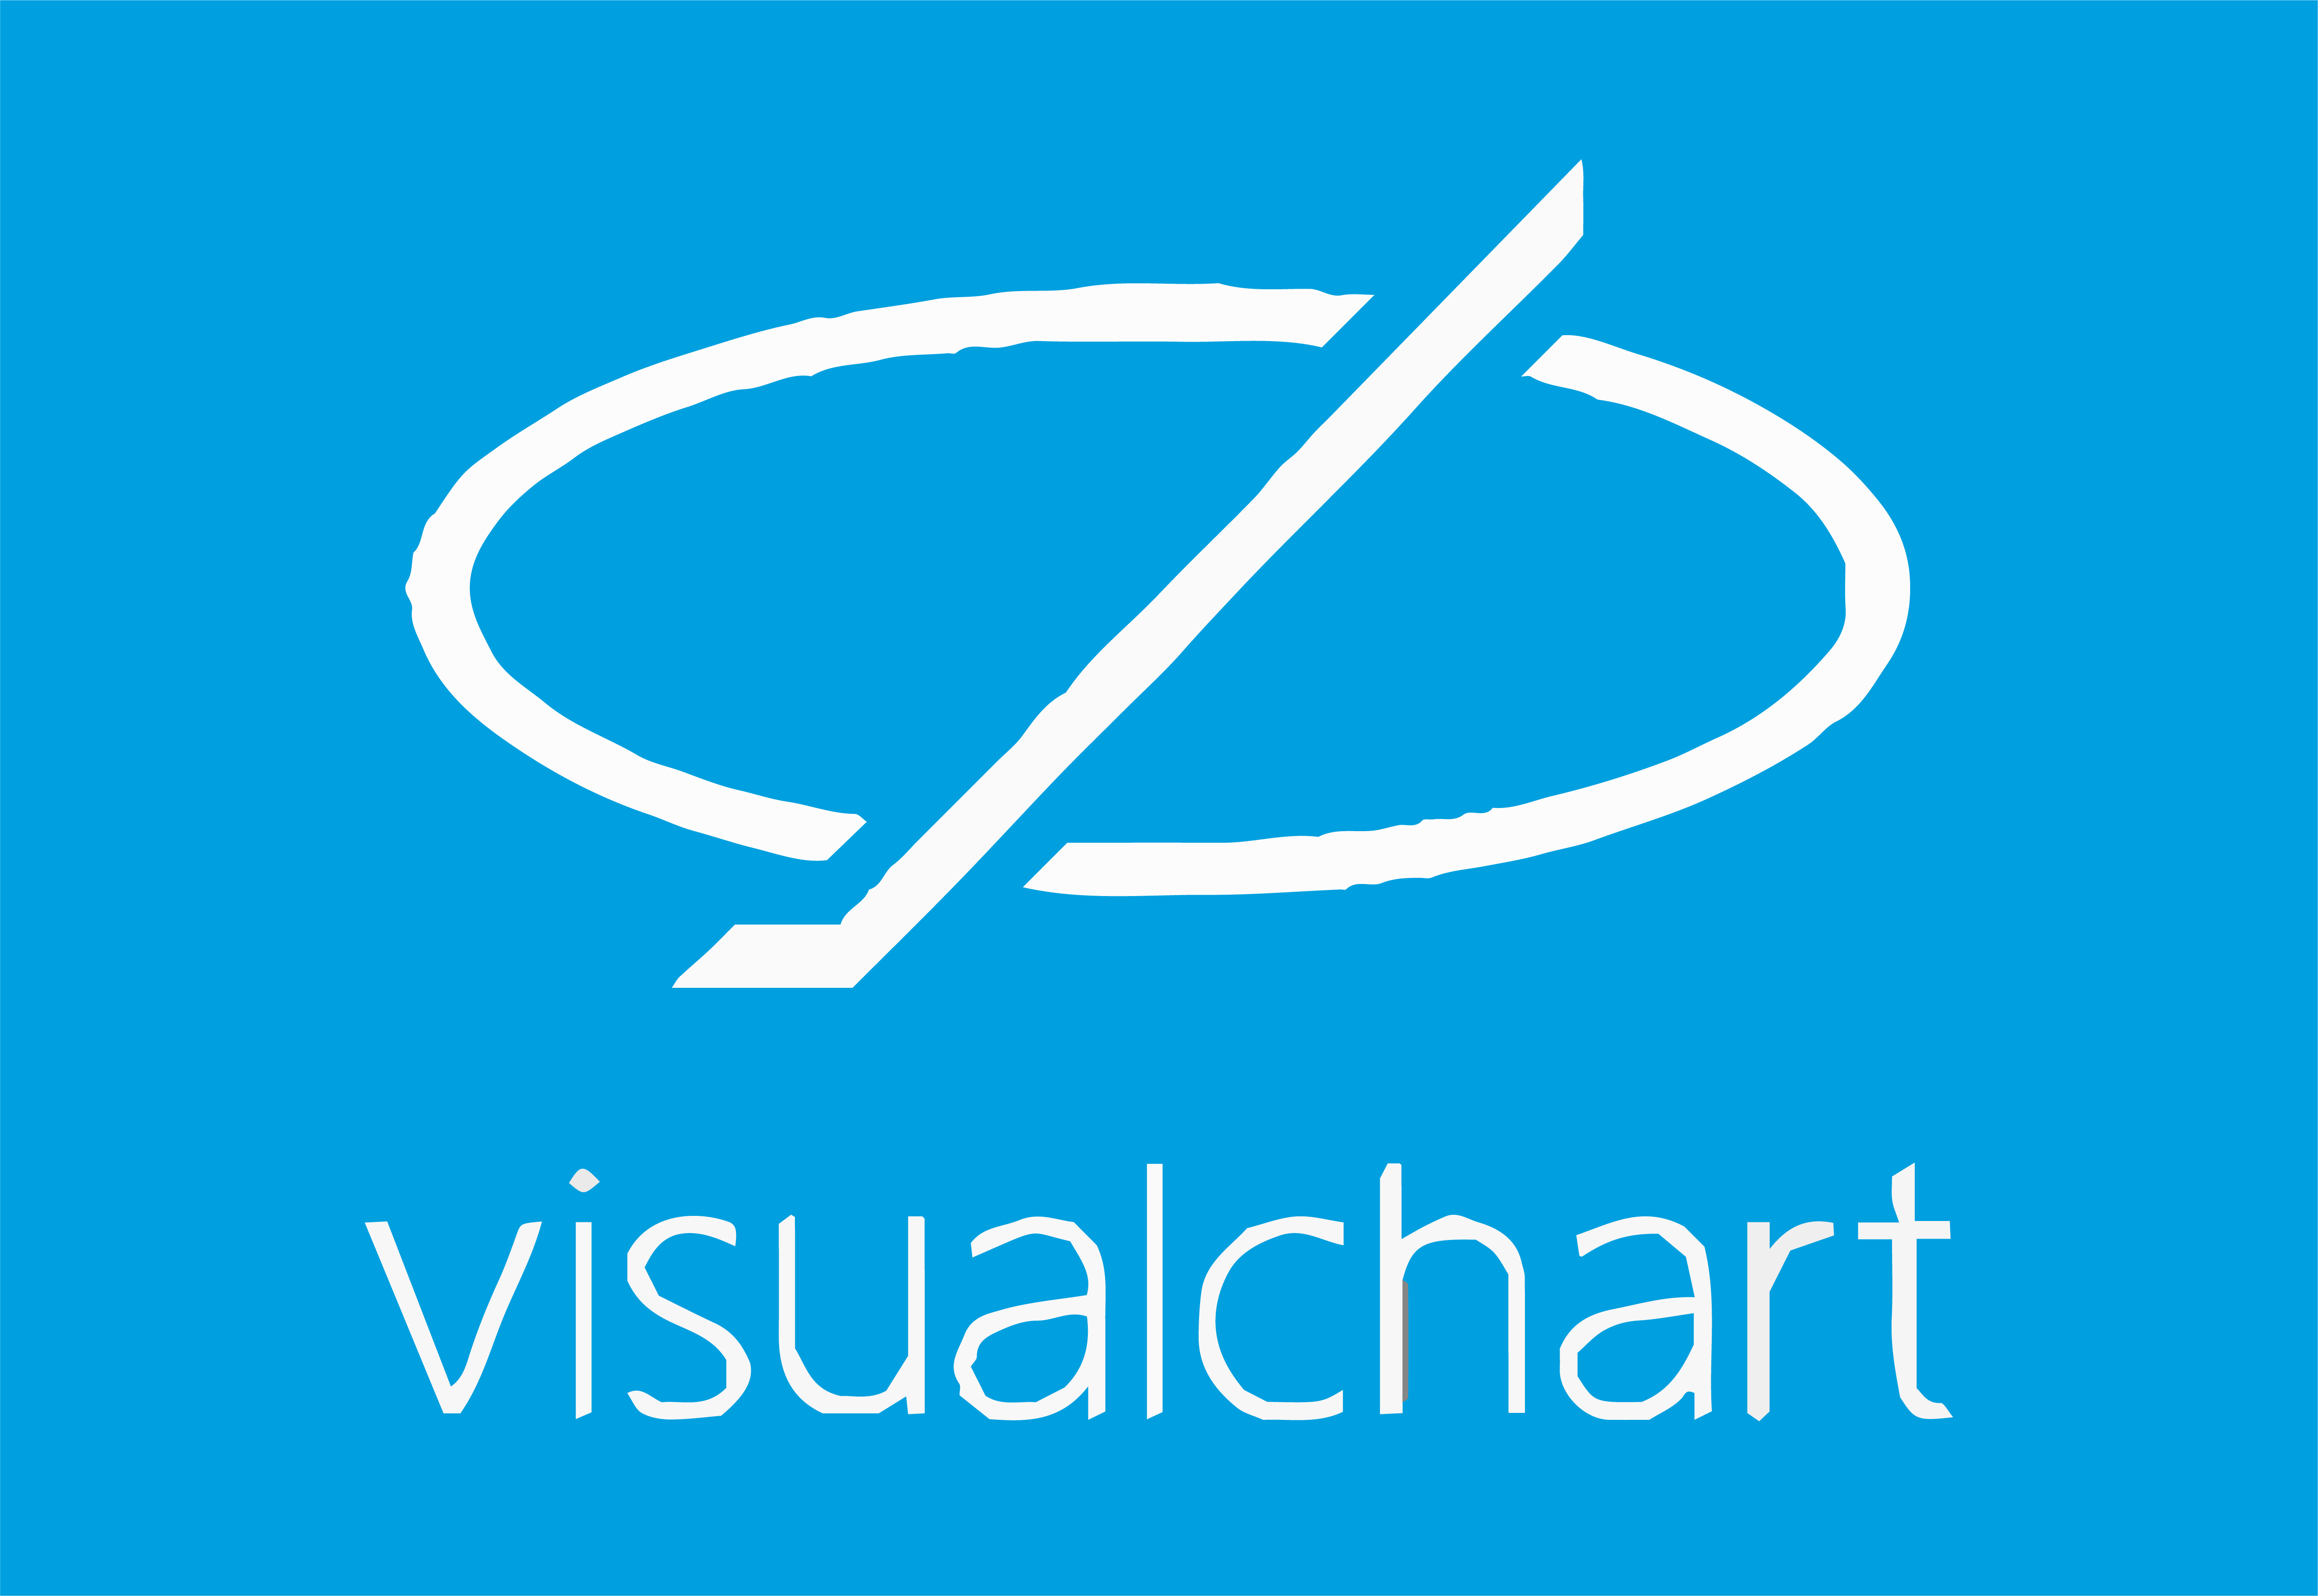 visual chart logo